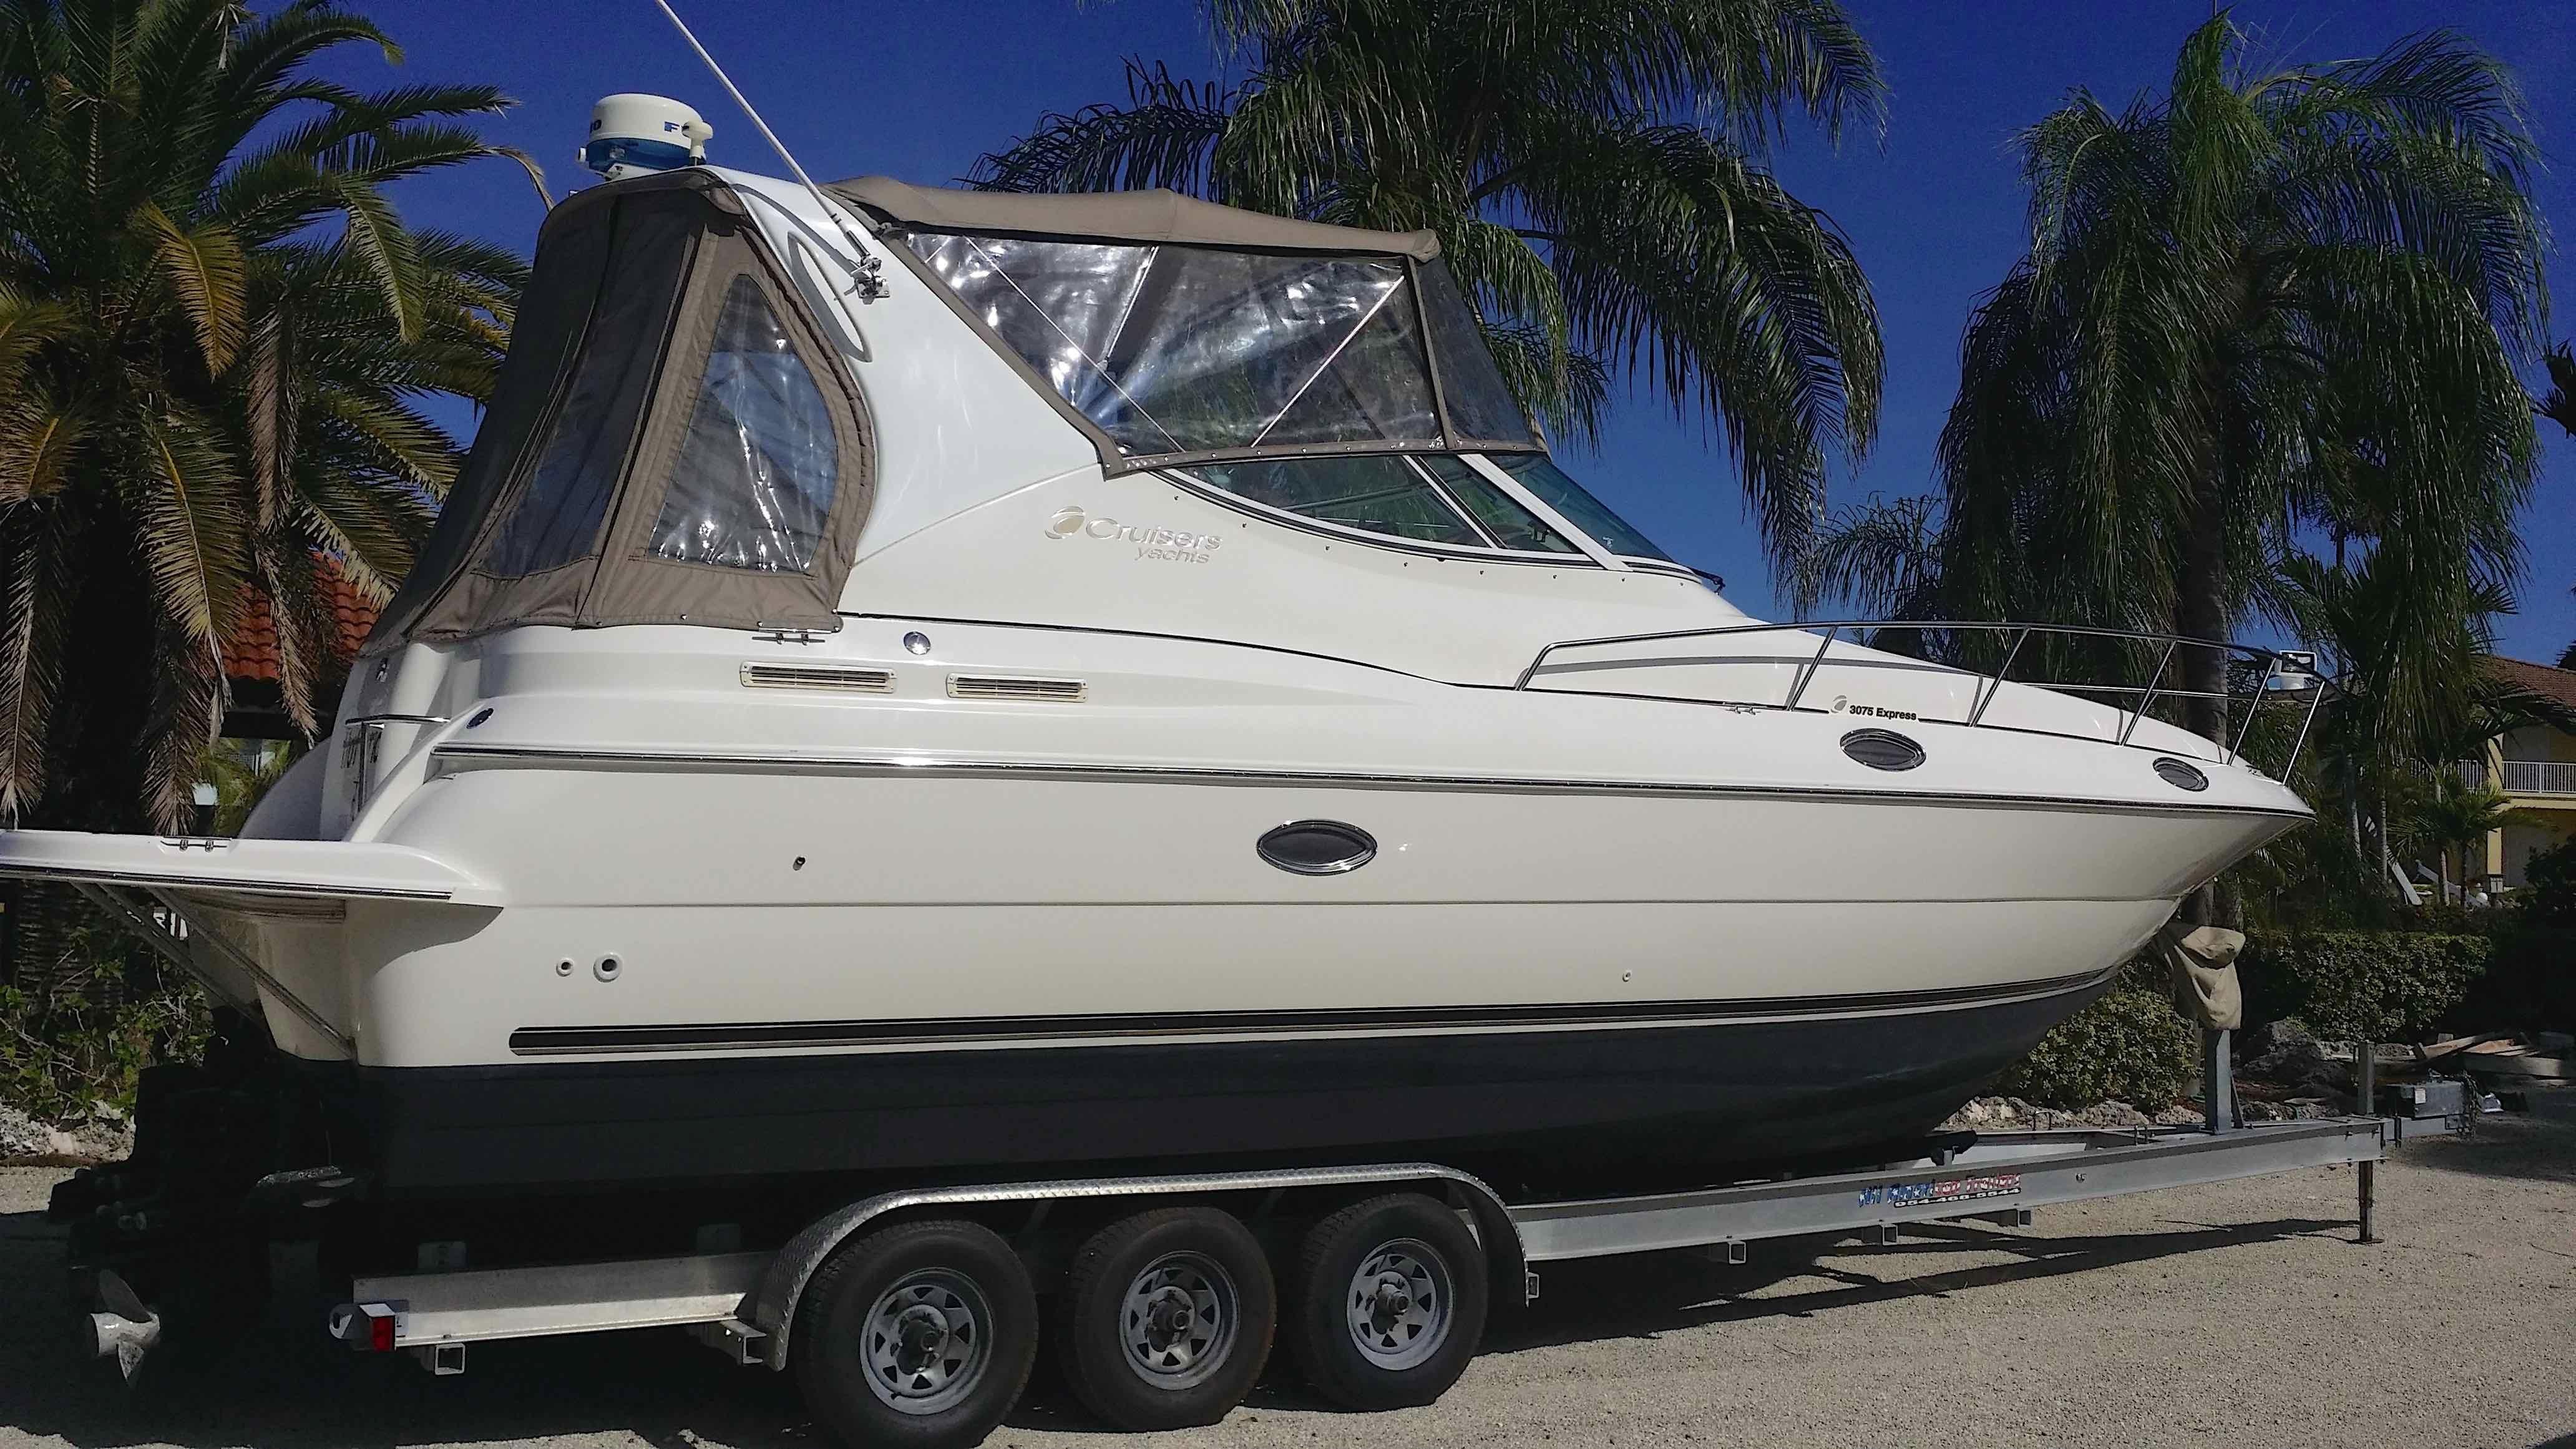 cabin hard express prod boats cruiser cabins top catamaran cruisers outboard titan sport fishing product